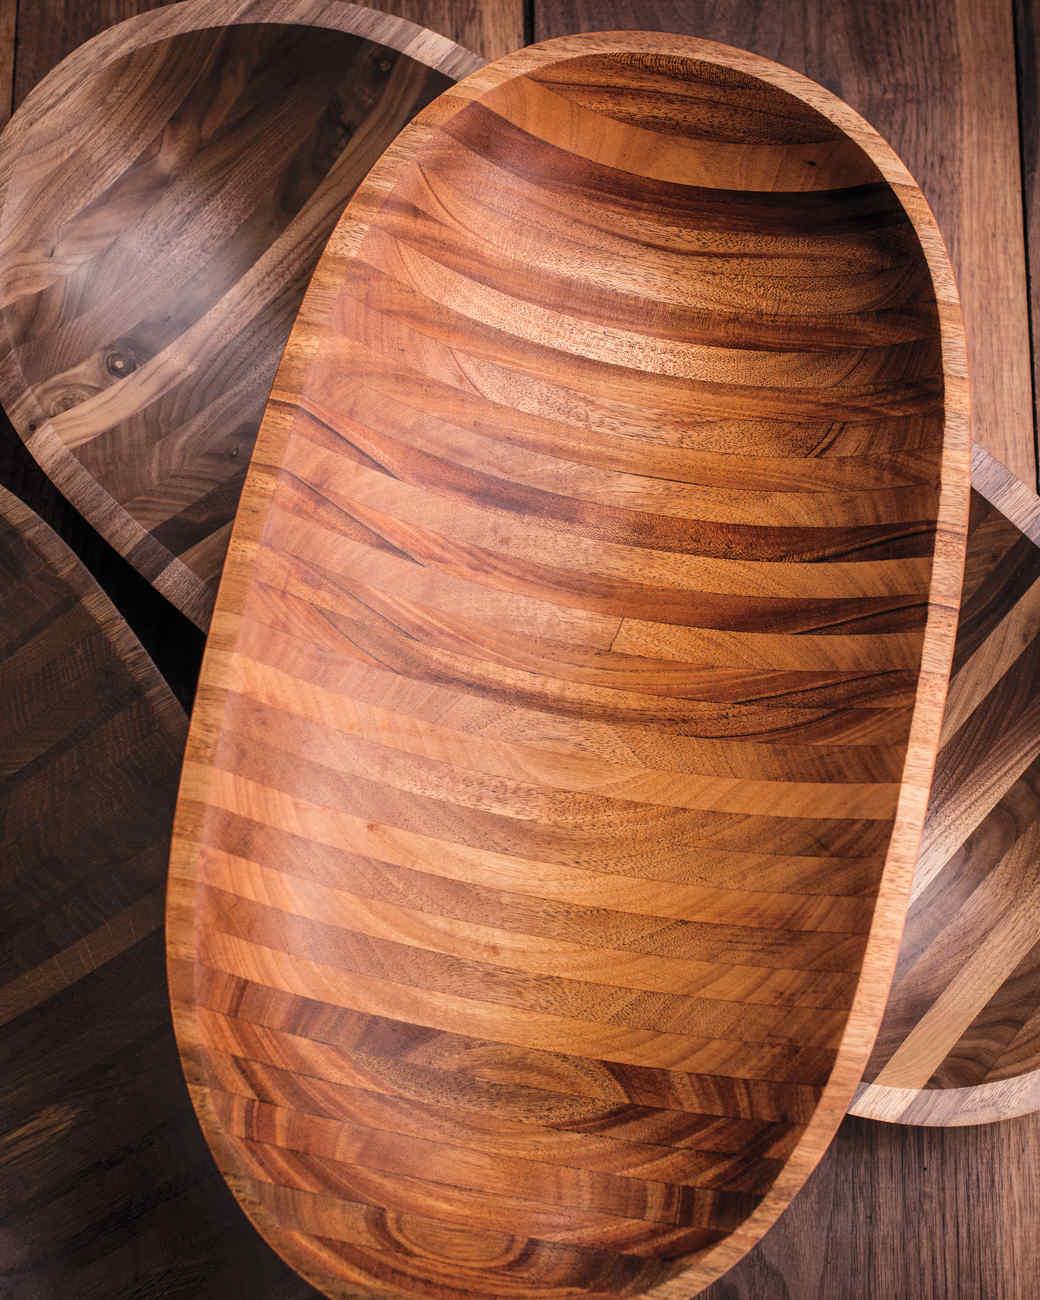 wooden-palate-546-mld110682.jpg